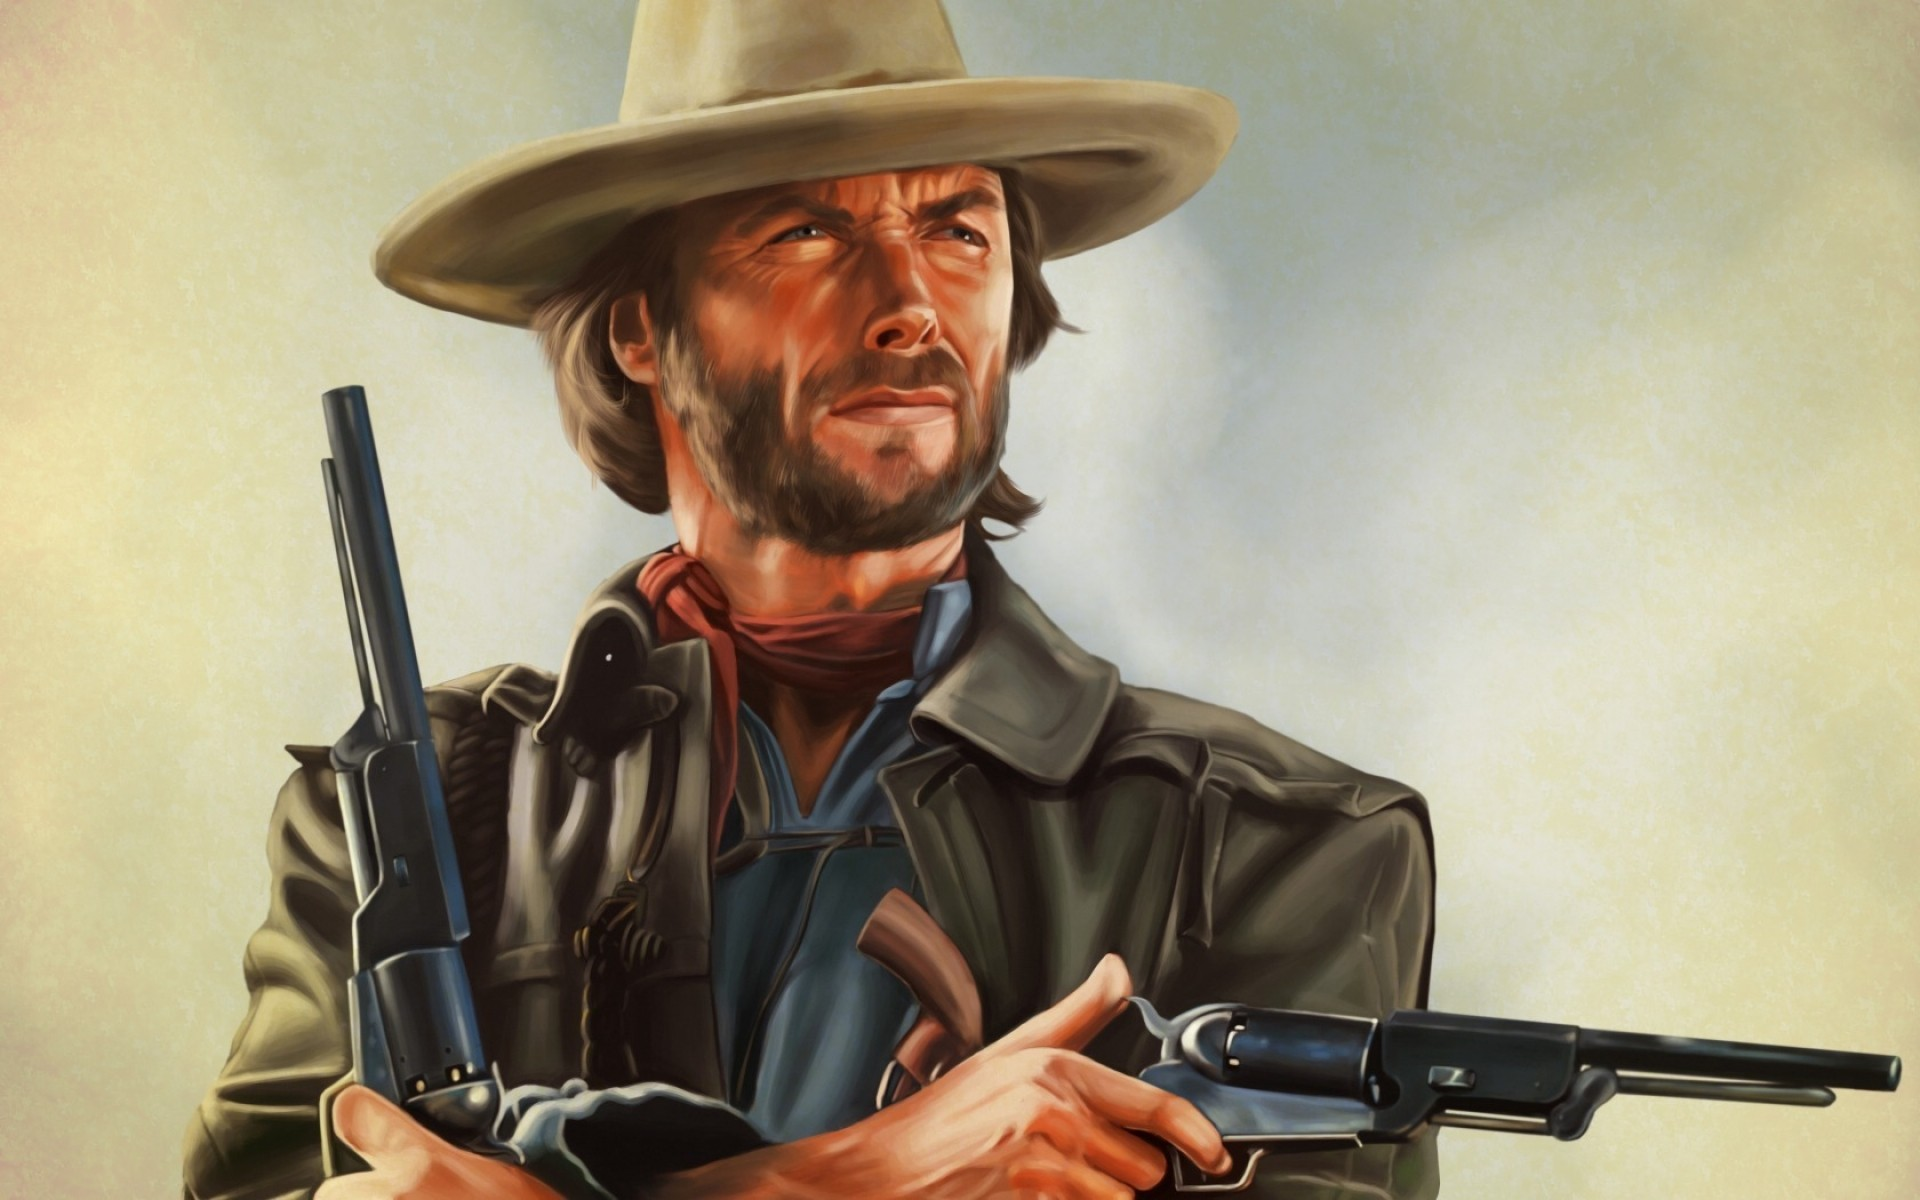 Clint Eastwood Artwork   Phone wallpapers